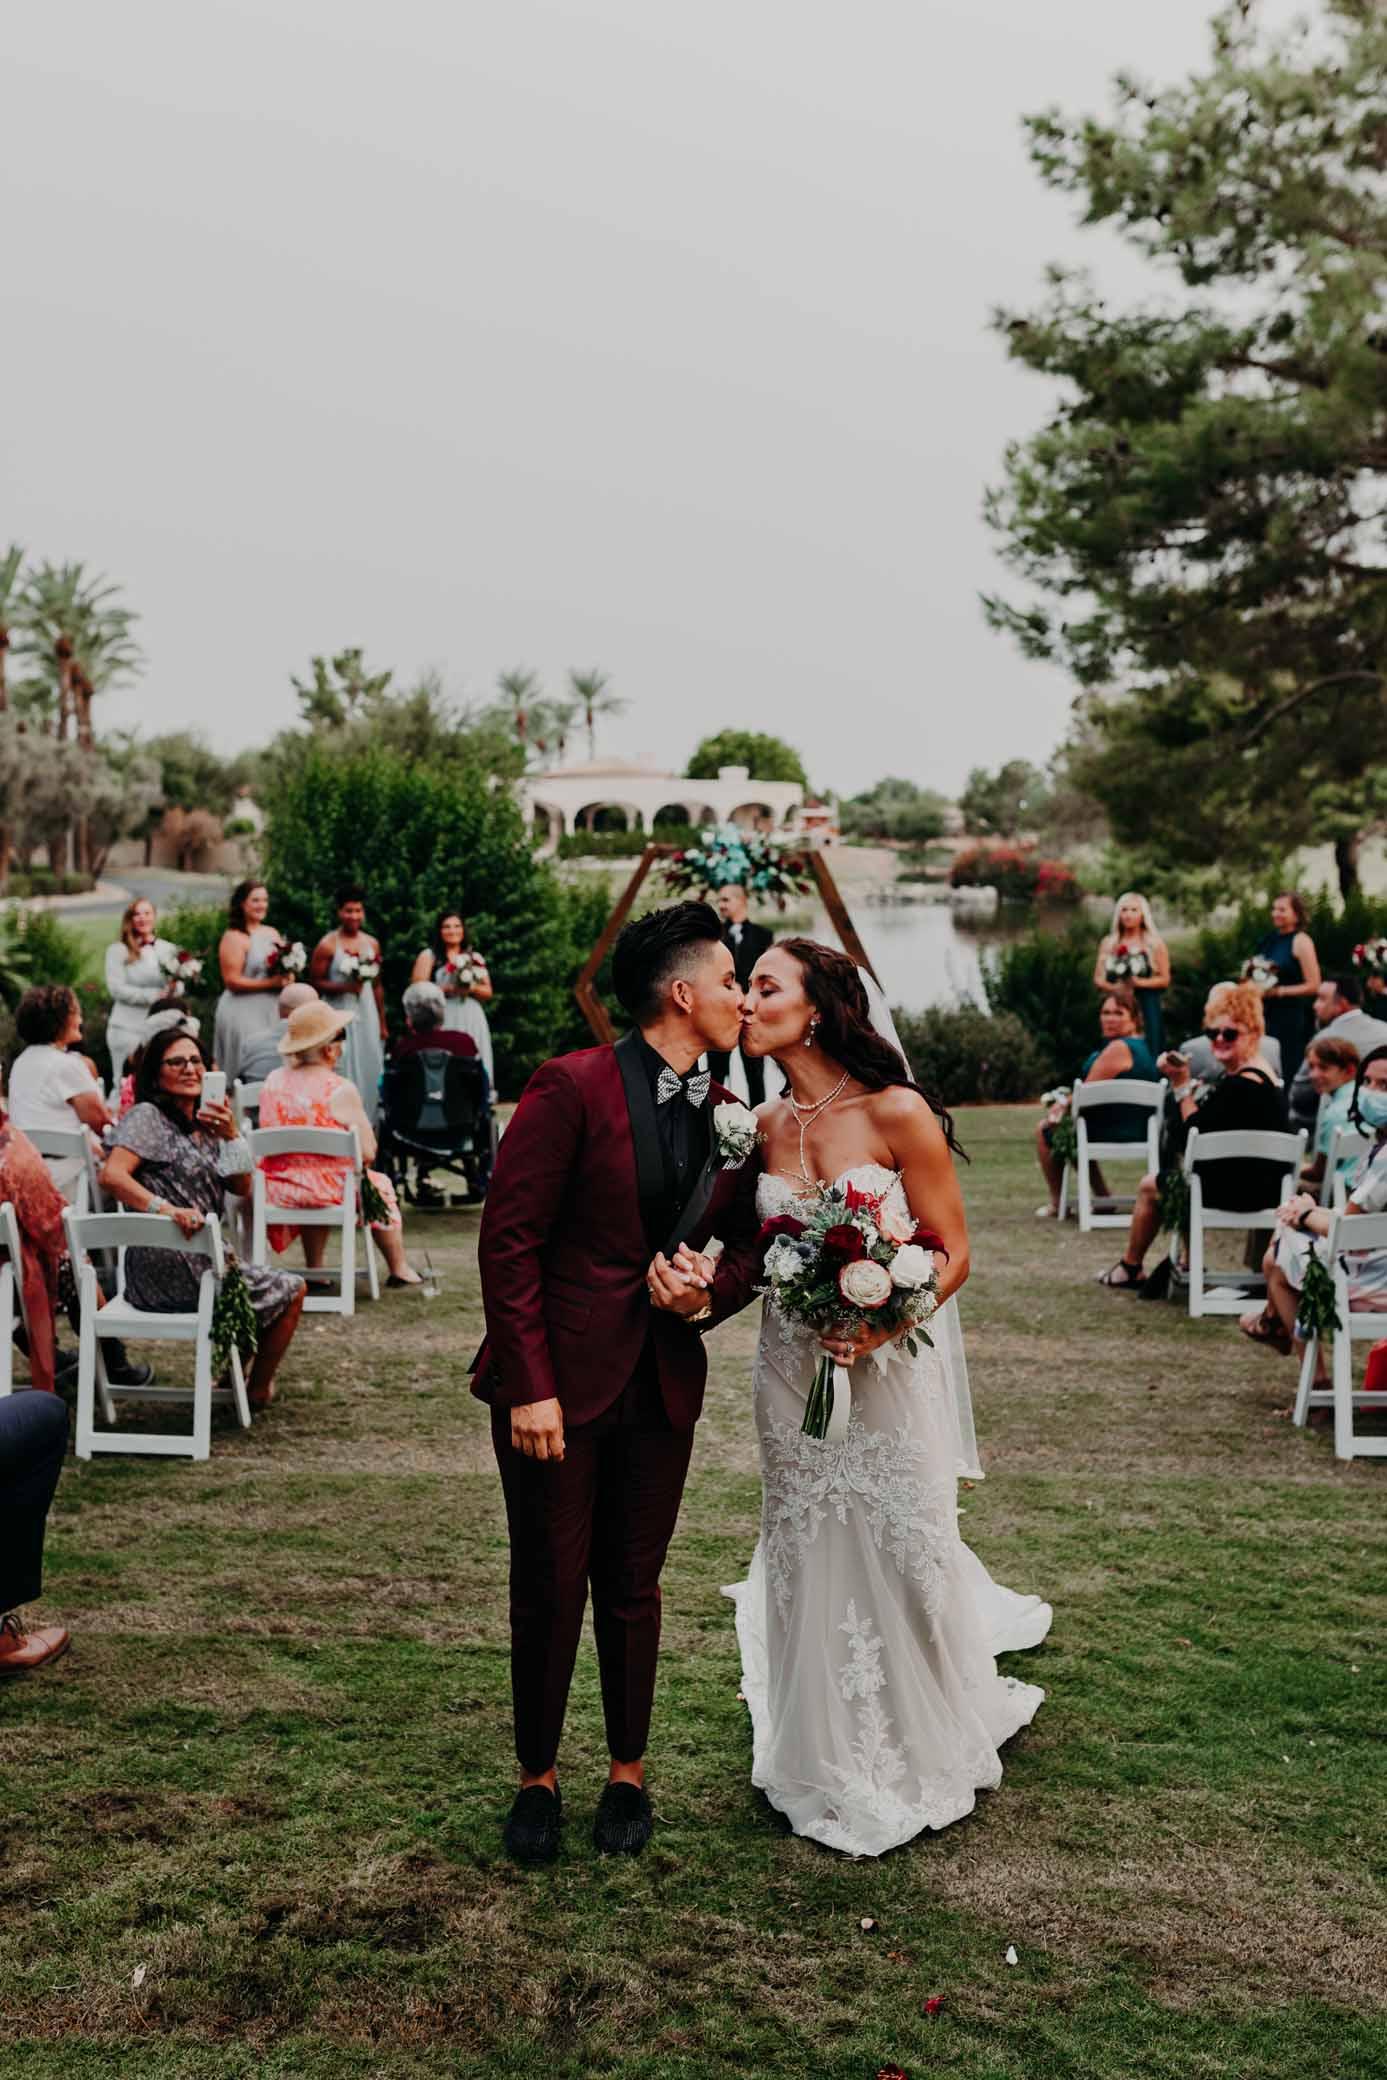 Suzy Goodrick Photography Arizona USA American lesbian two bride gay wedding elopement Dancing With Her online directory magazine